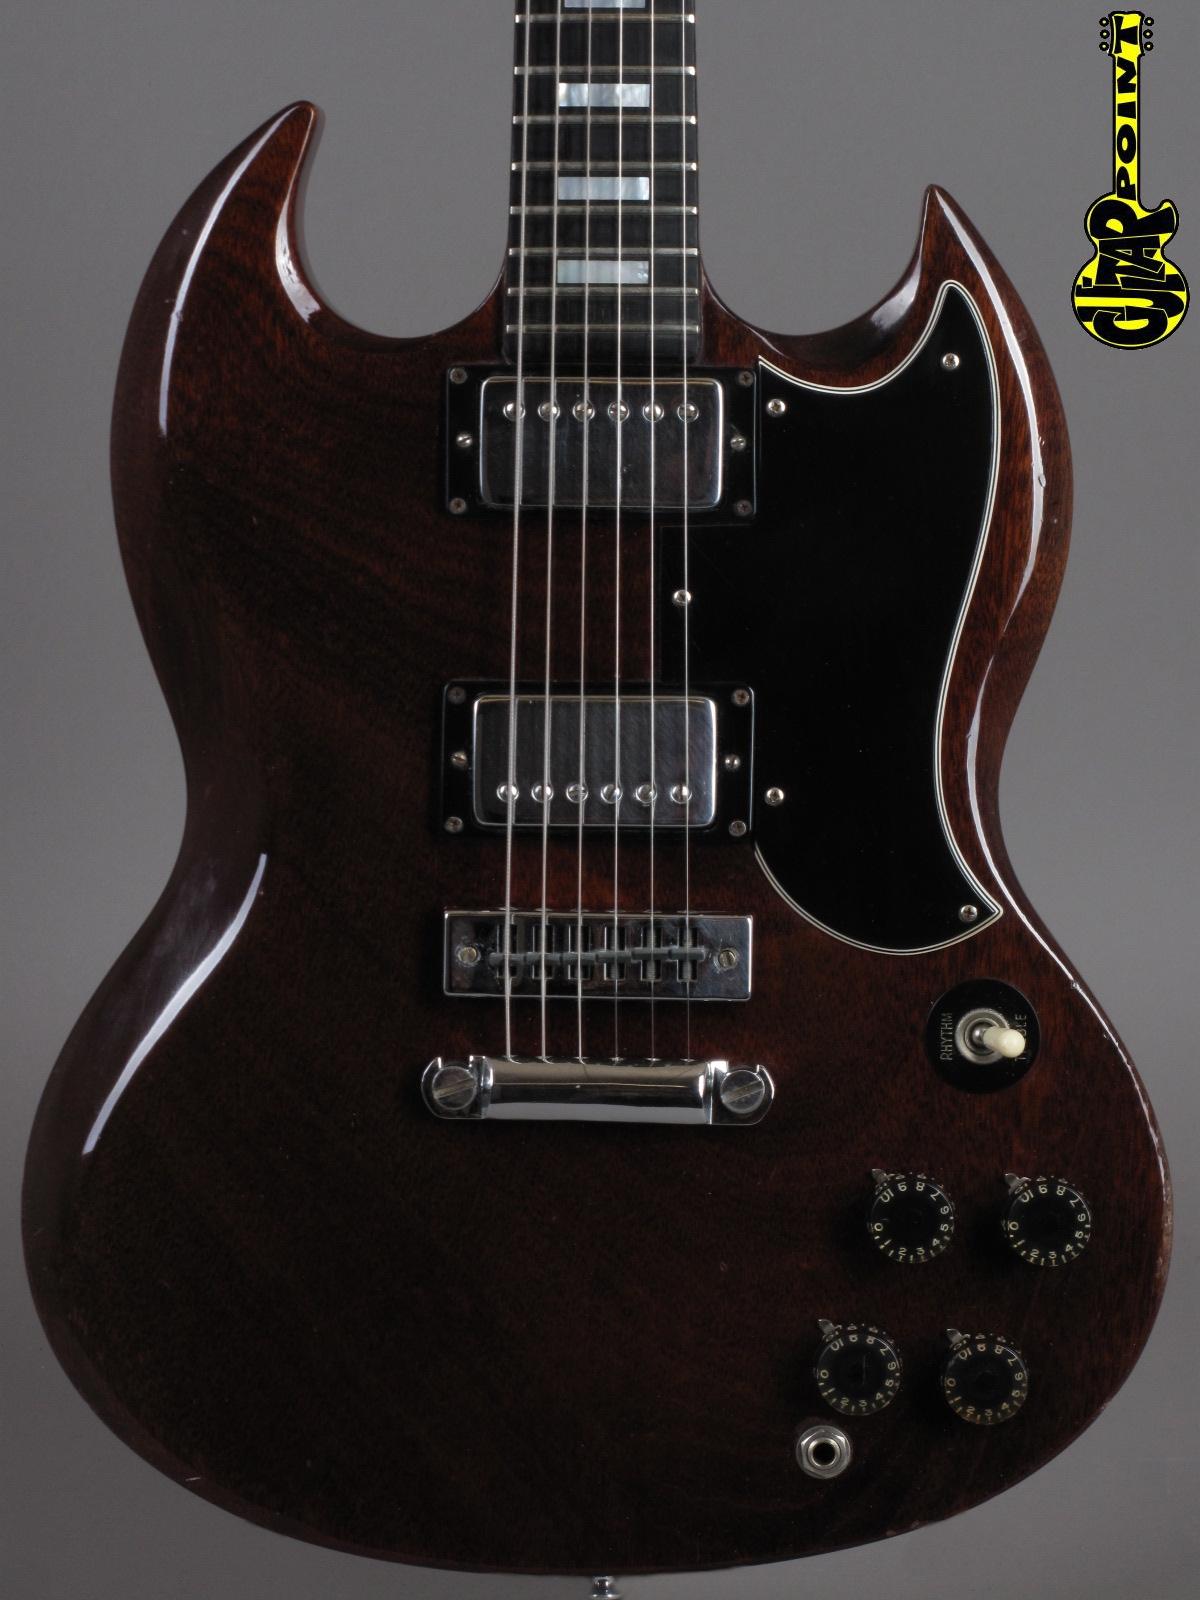 1973 Gibson SG Standard - Cherry